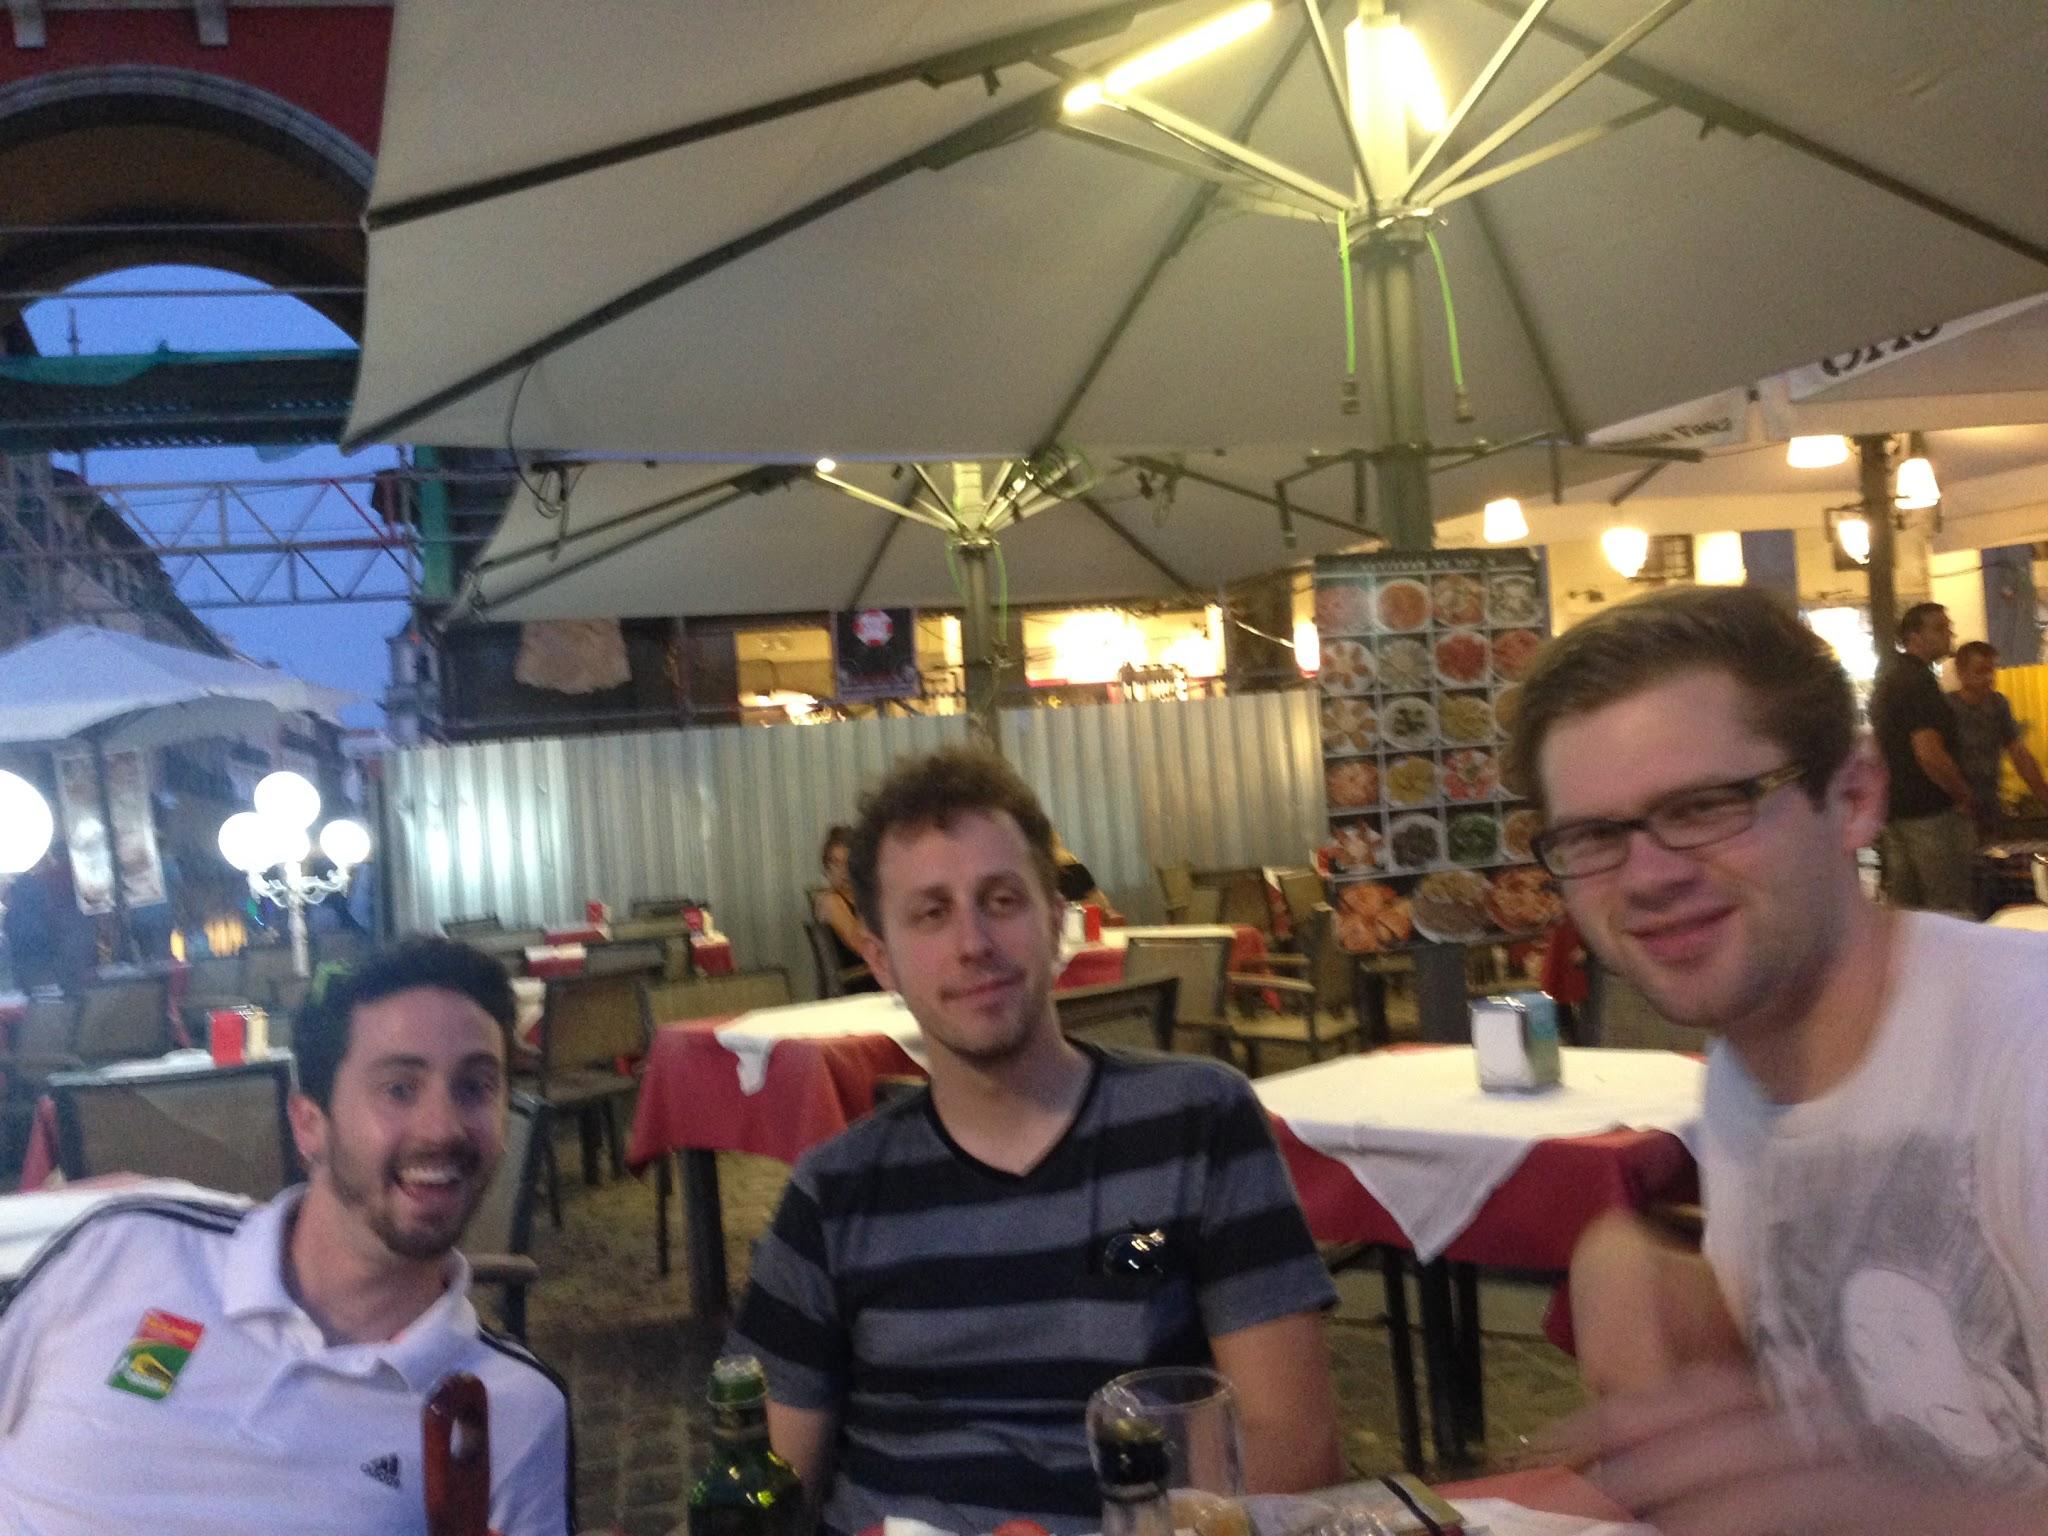 Photo: Paul with Jon and Gabe (Haley Group)